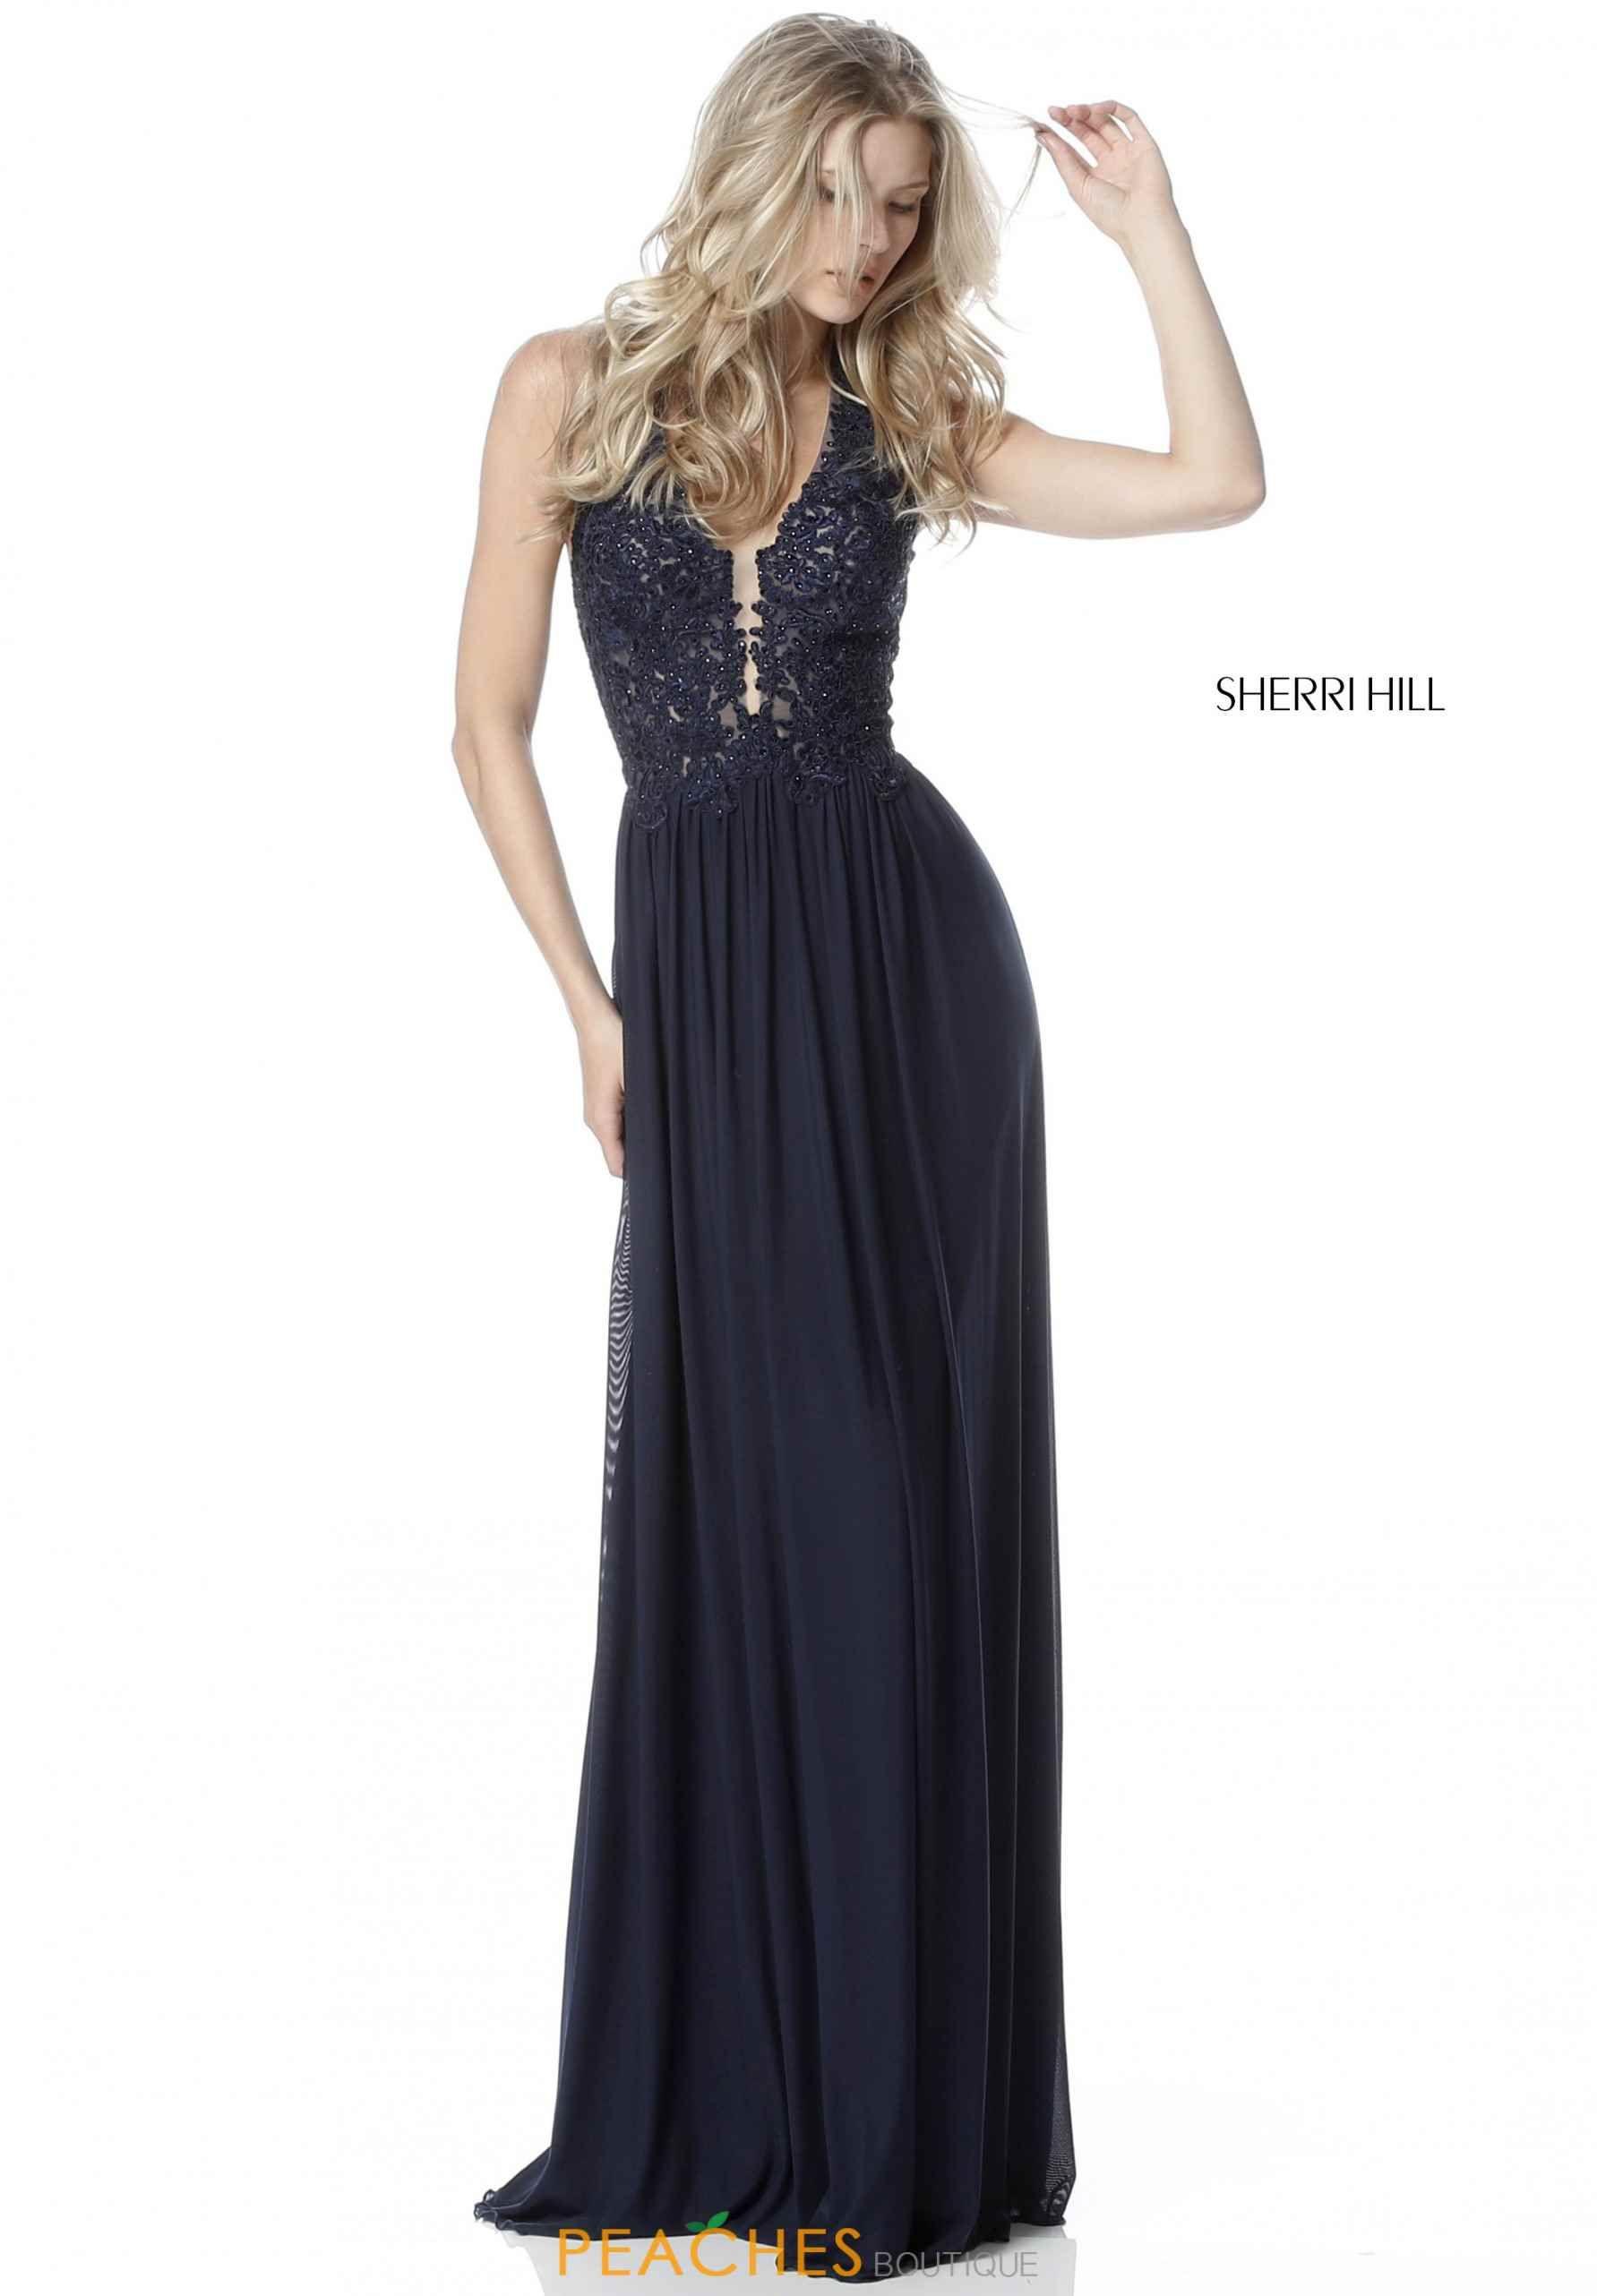 Sherri hill halter a line dress dresses pinterest sherri